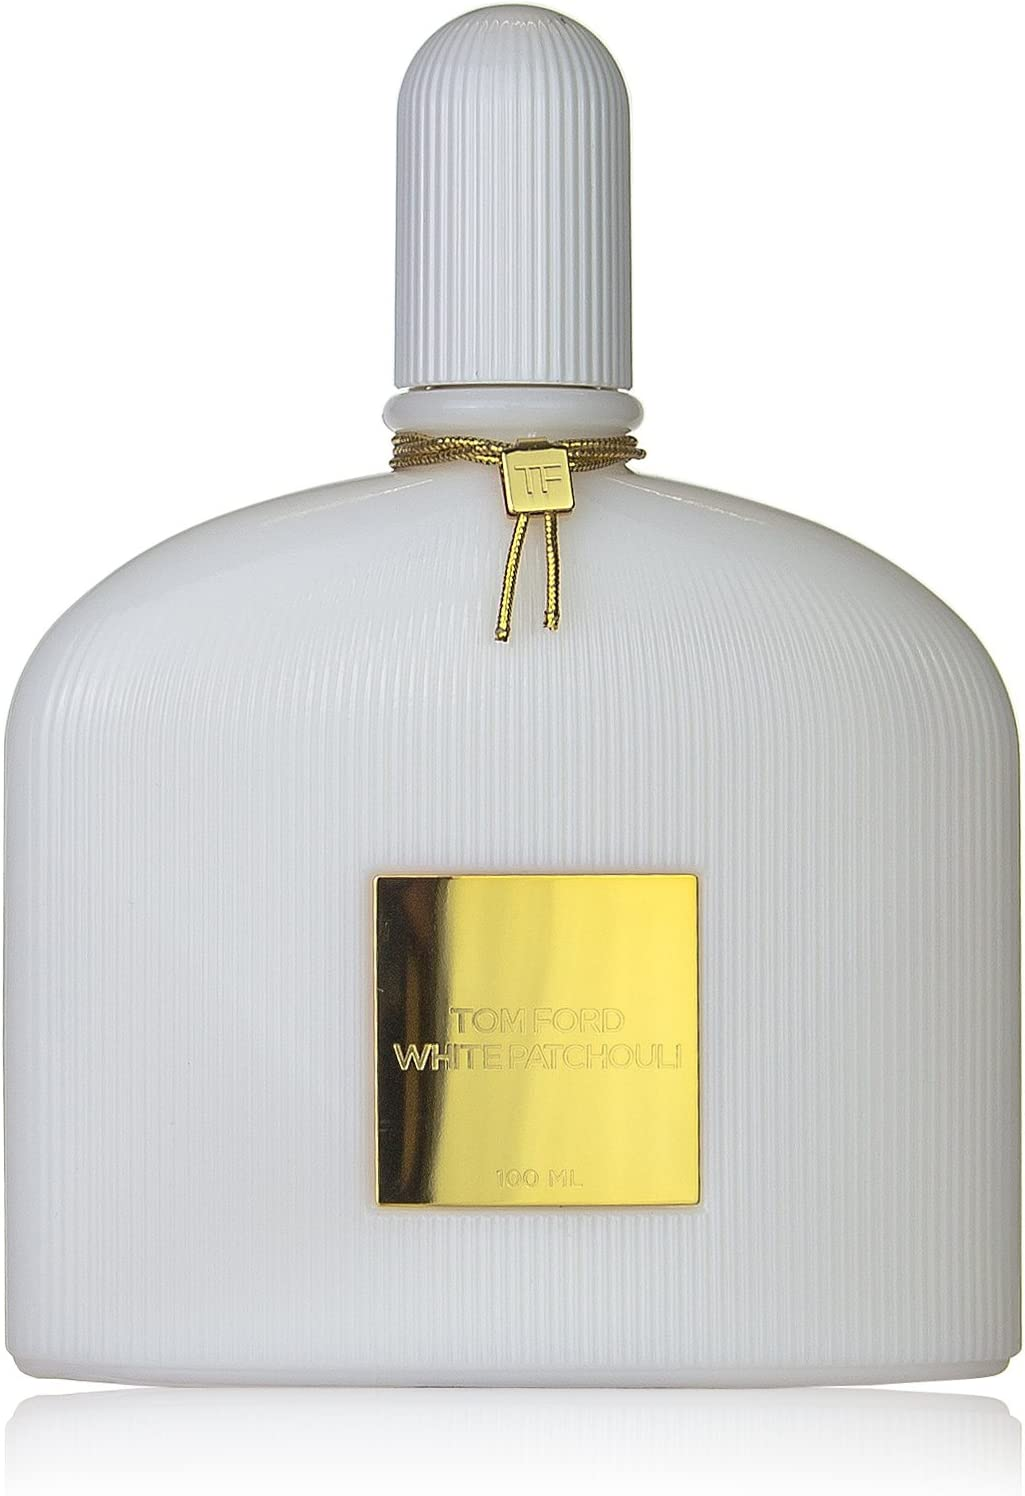 tom ford white perfume